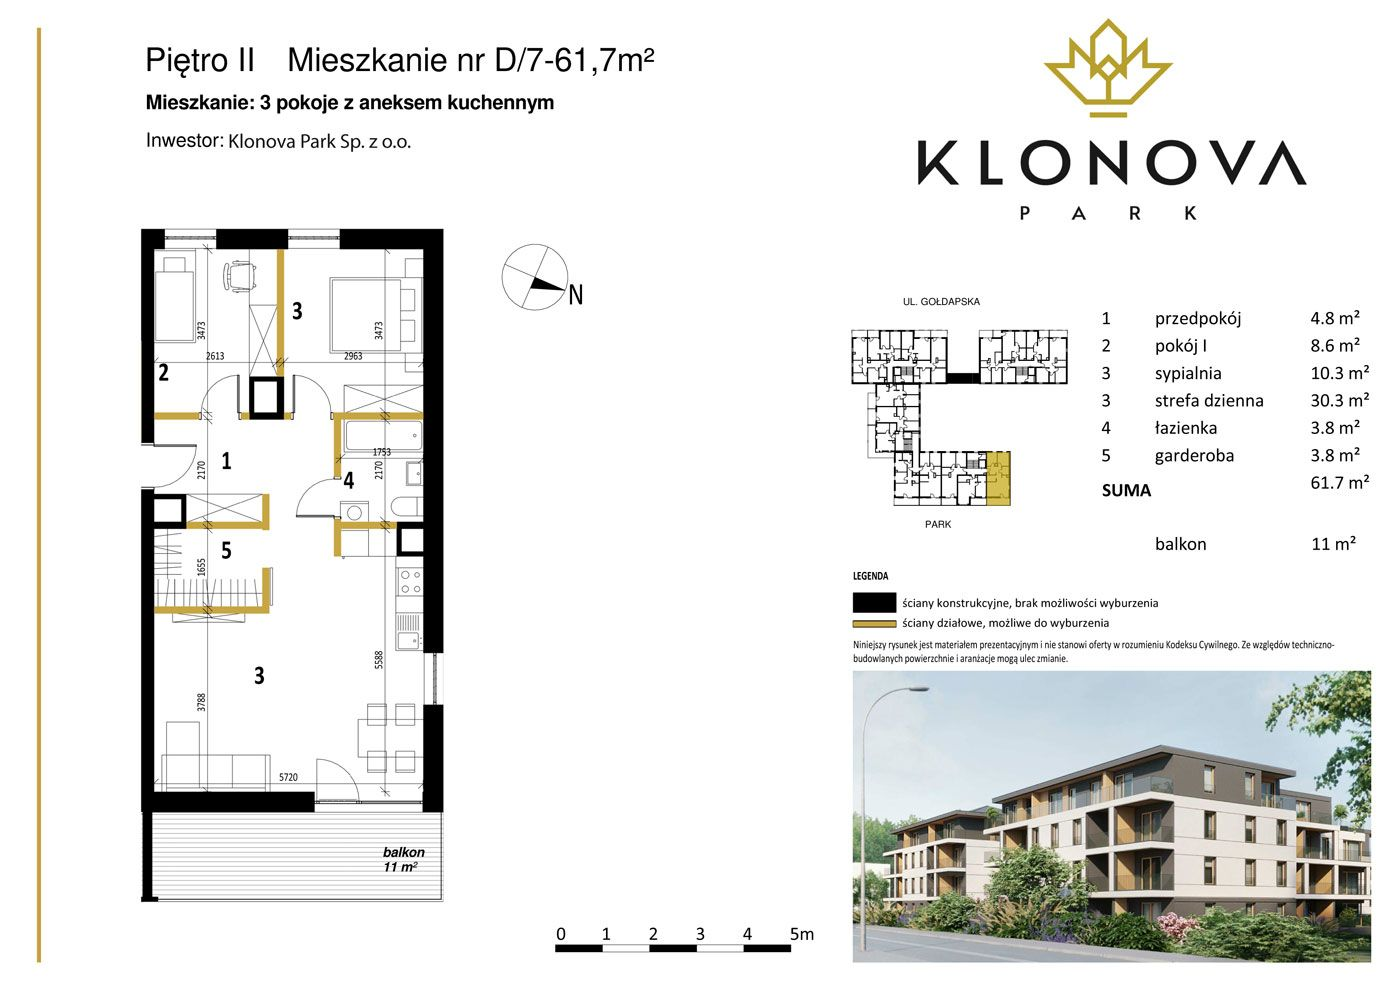 Apartamenty Klonova Park - Plan mieszkania D/7